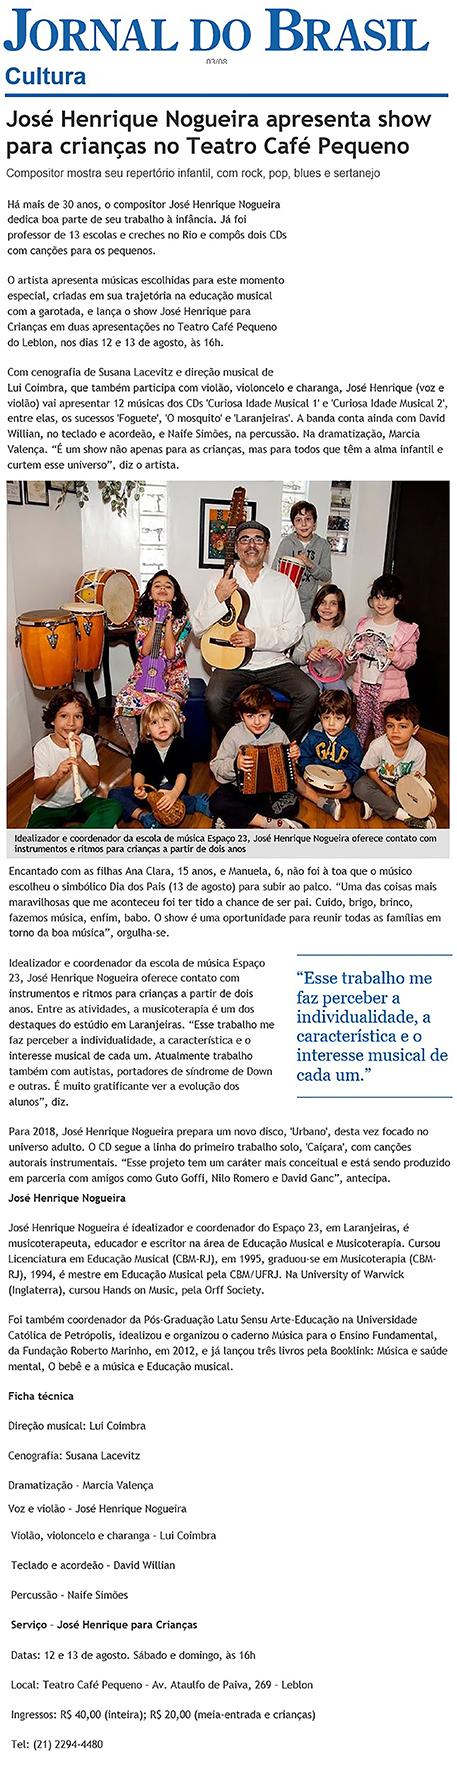 Jornal do Brasil - Cultura